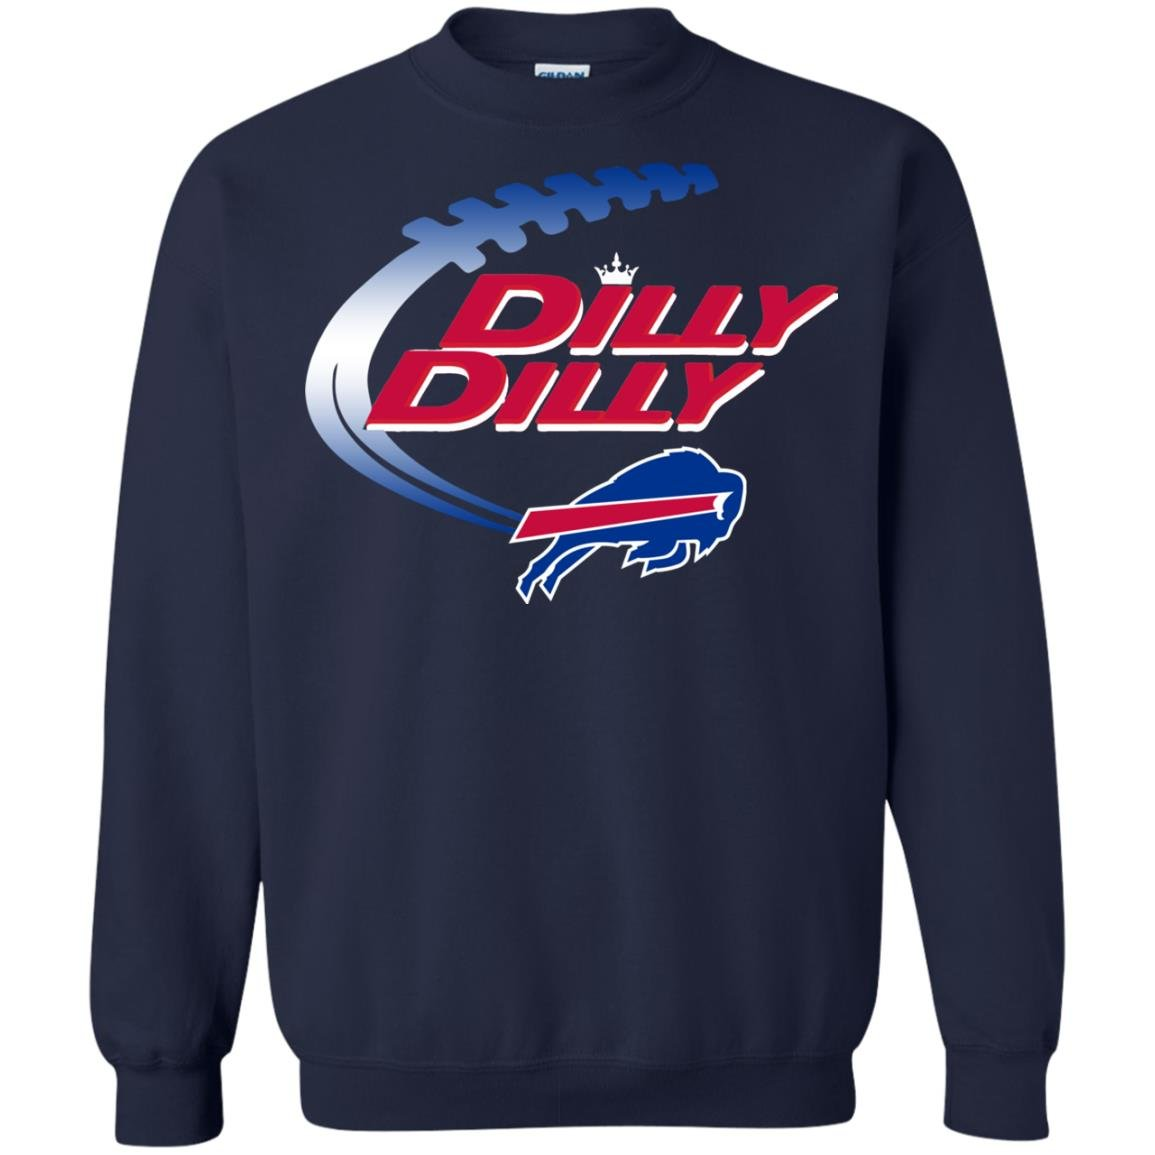 image 1872 - Dilly Dilly Buffalo Bills Shirt, Sweatshirt, Hoodie